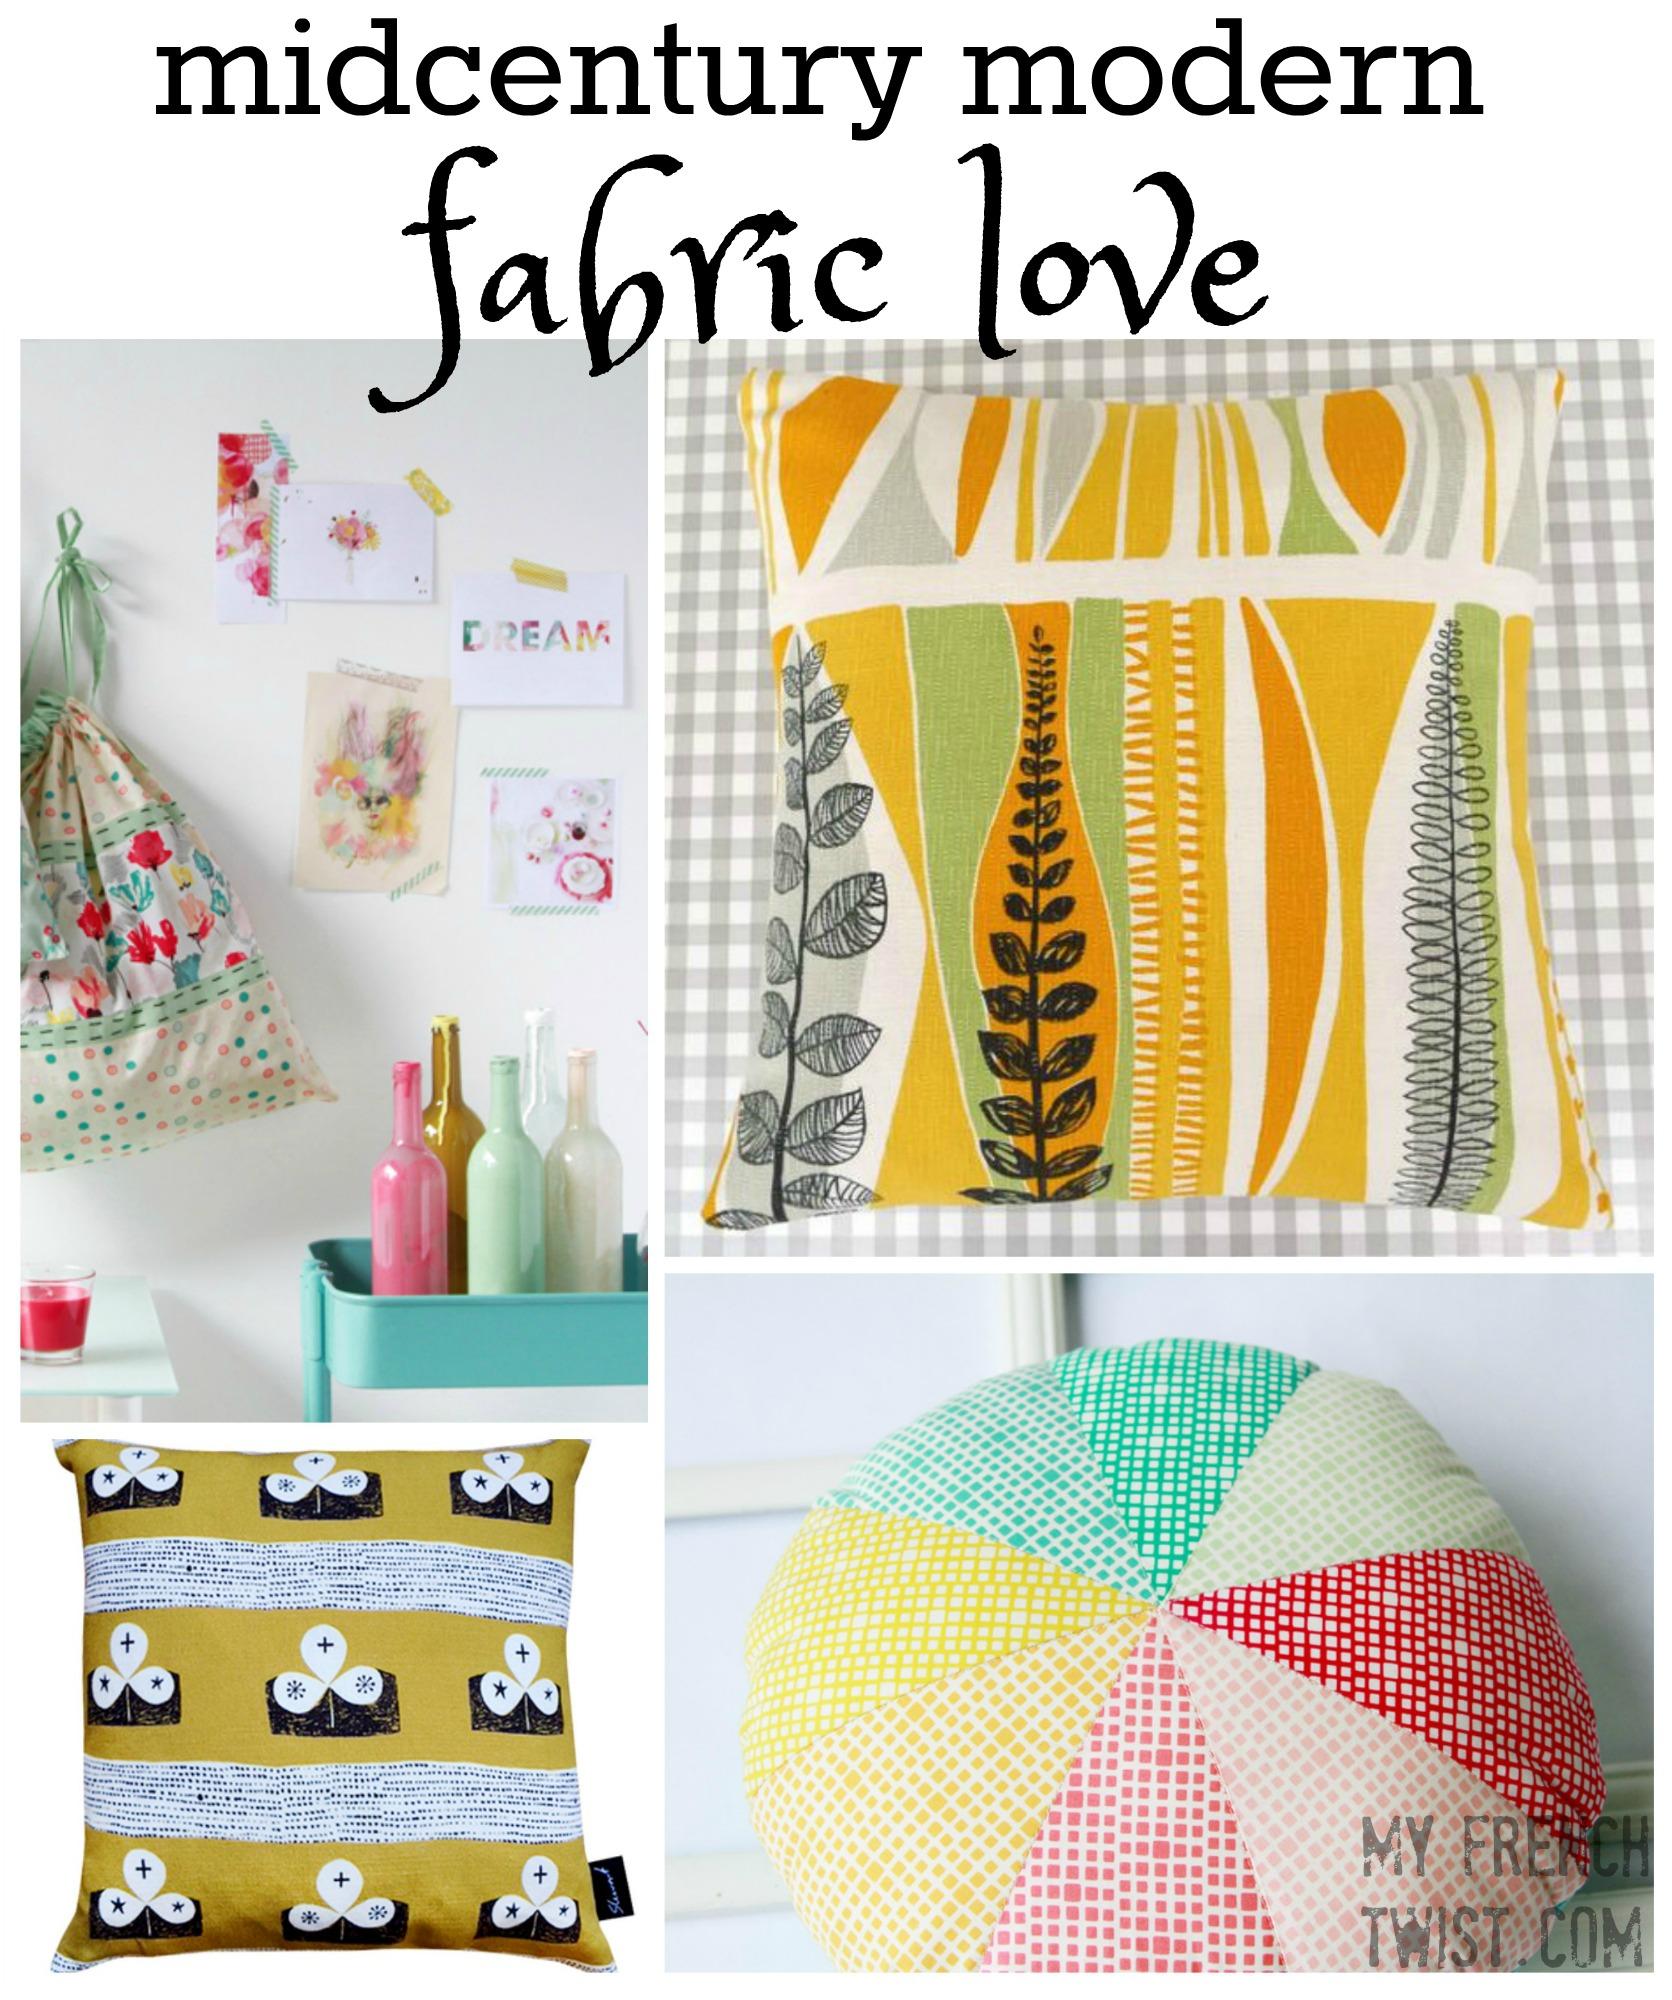 midcentury modern fabric love - My French Twist